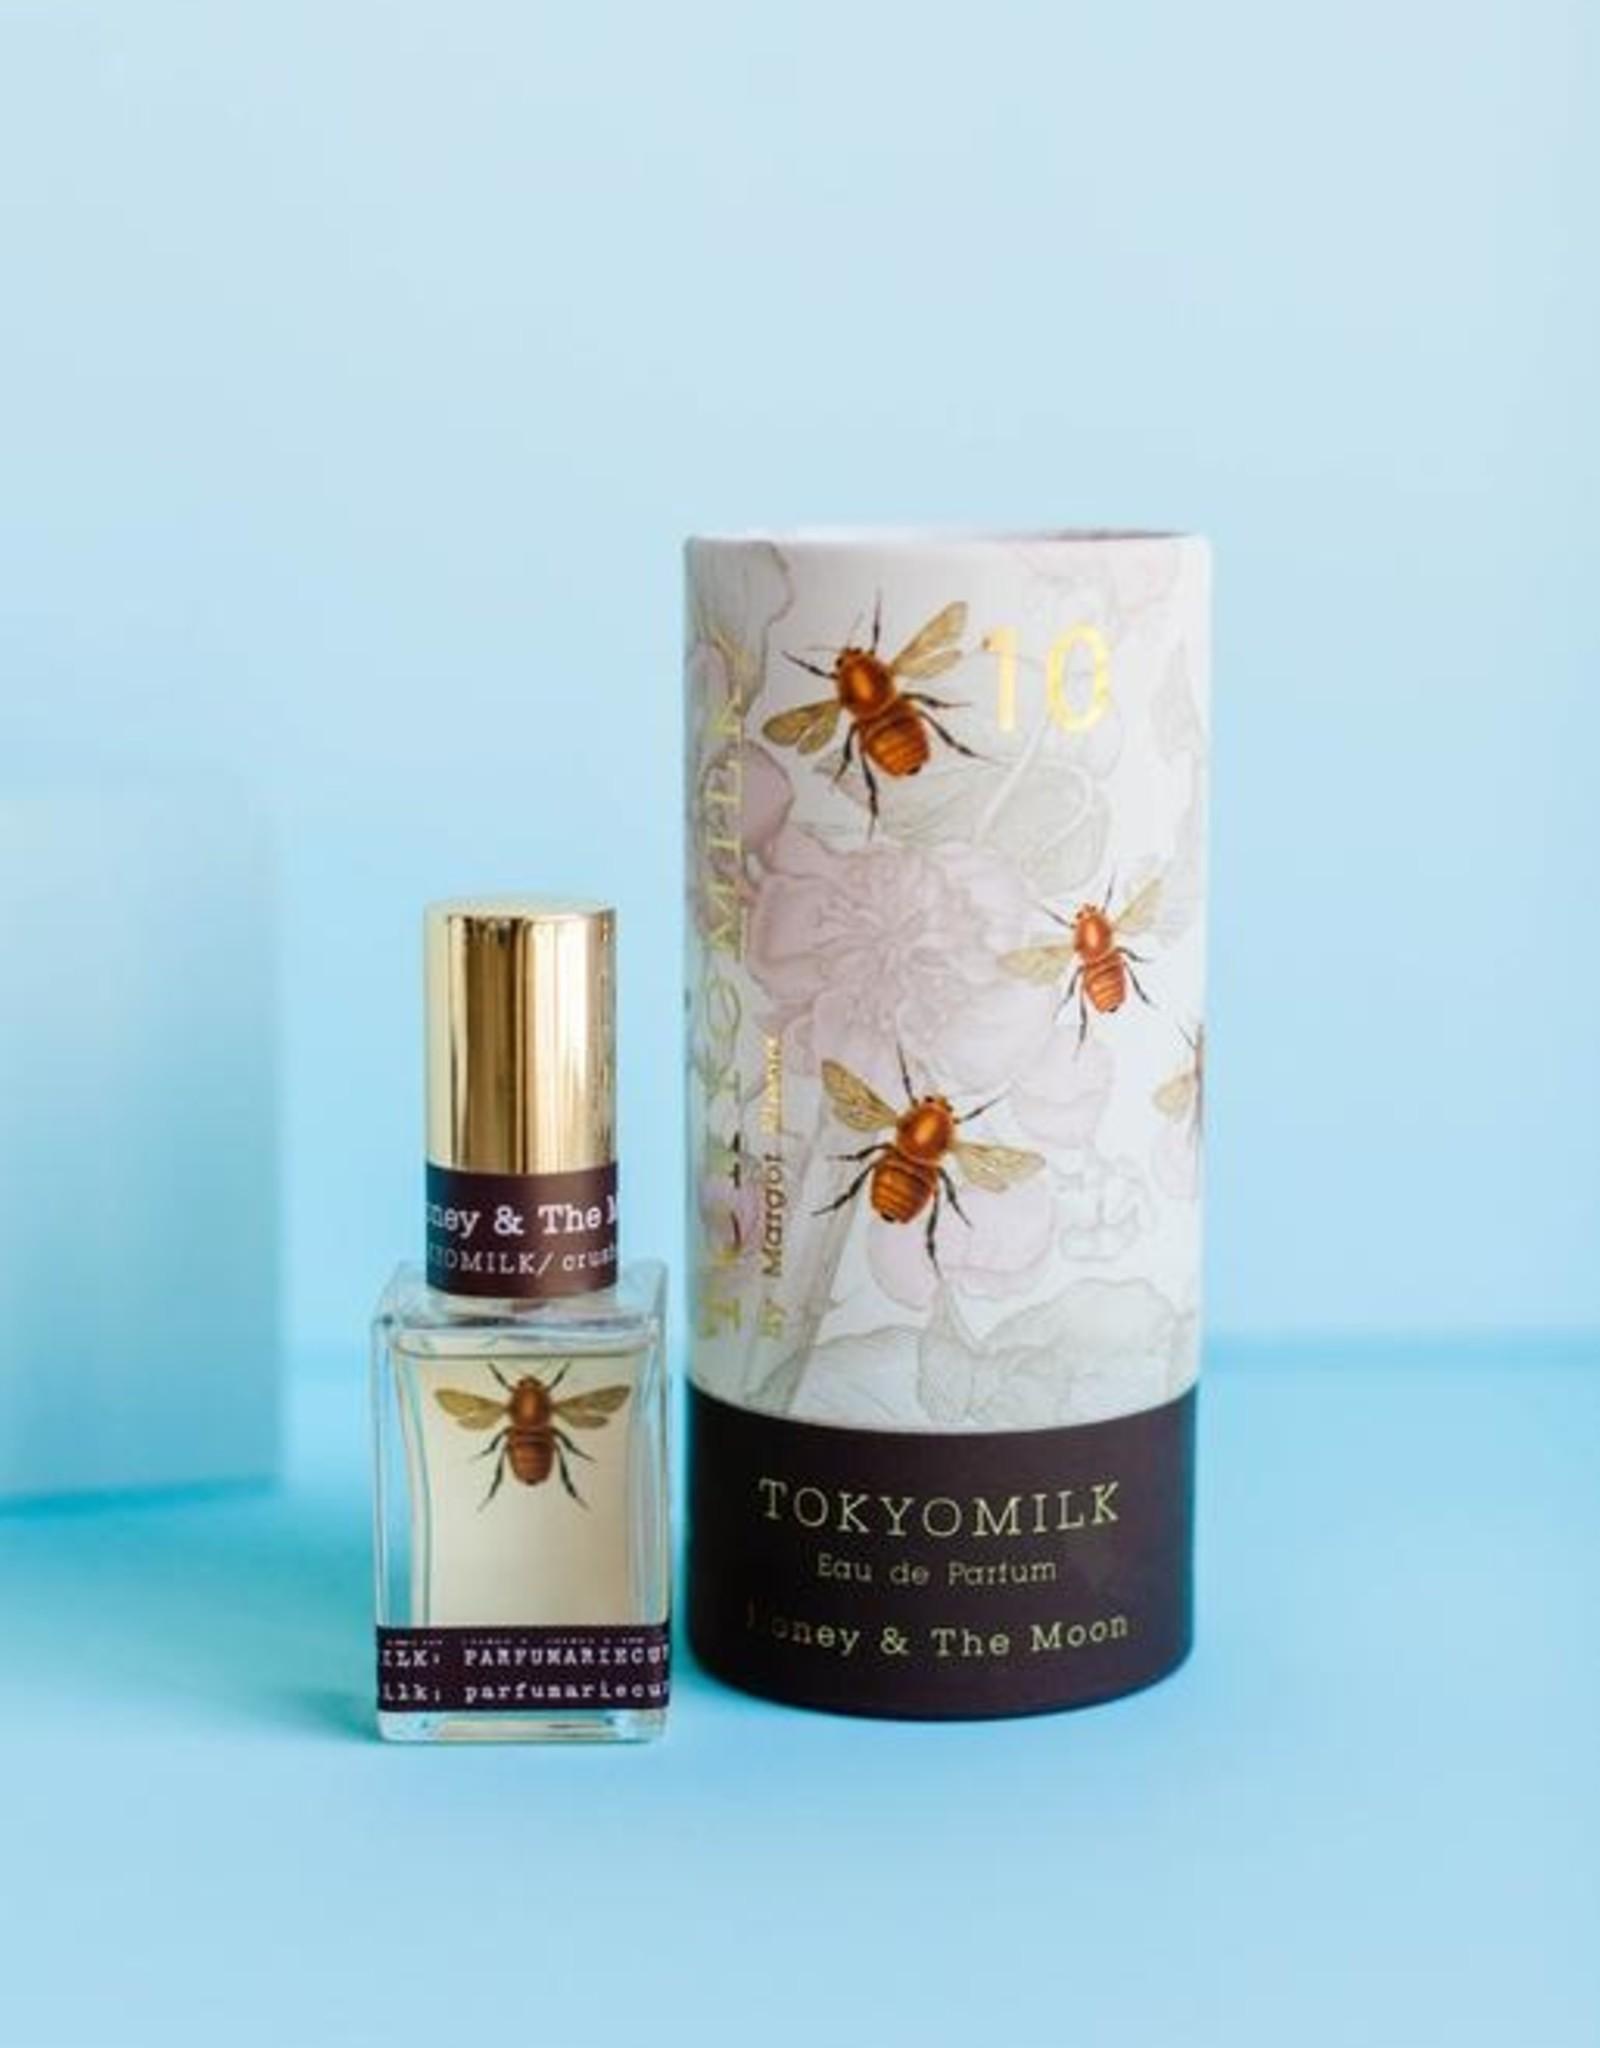 Tokyo Milk TokyoMilk Honey & The Moon 10 Perfume